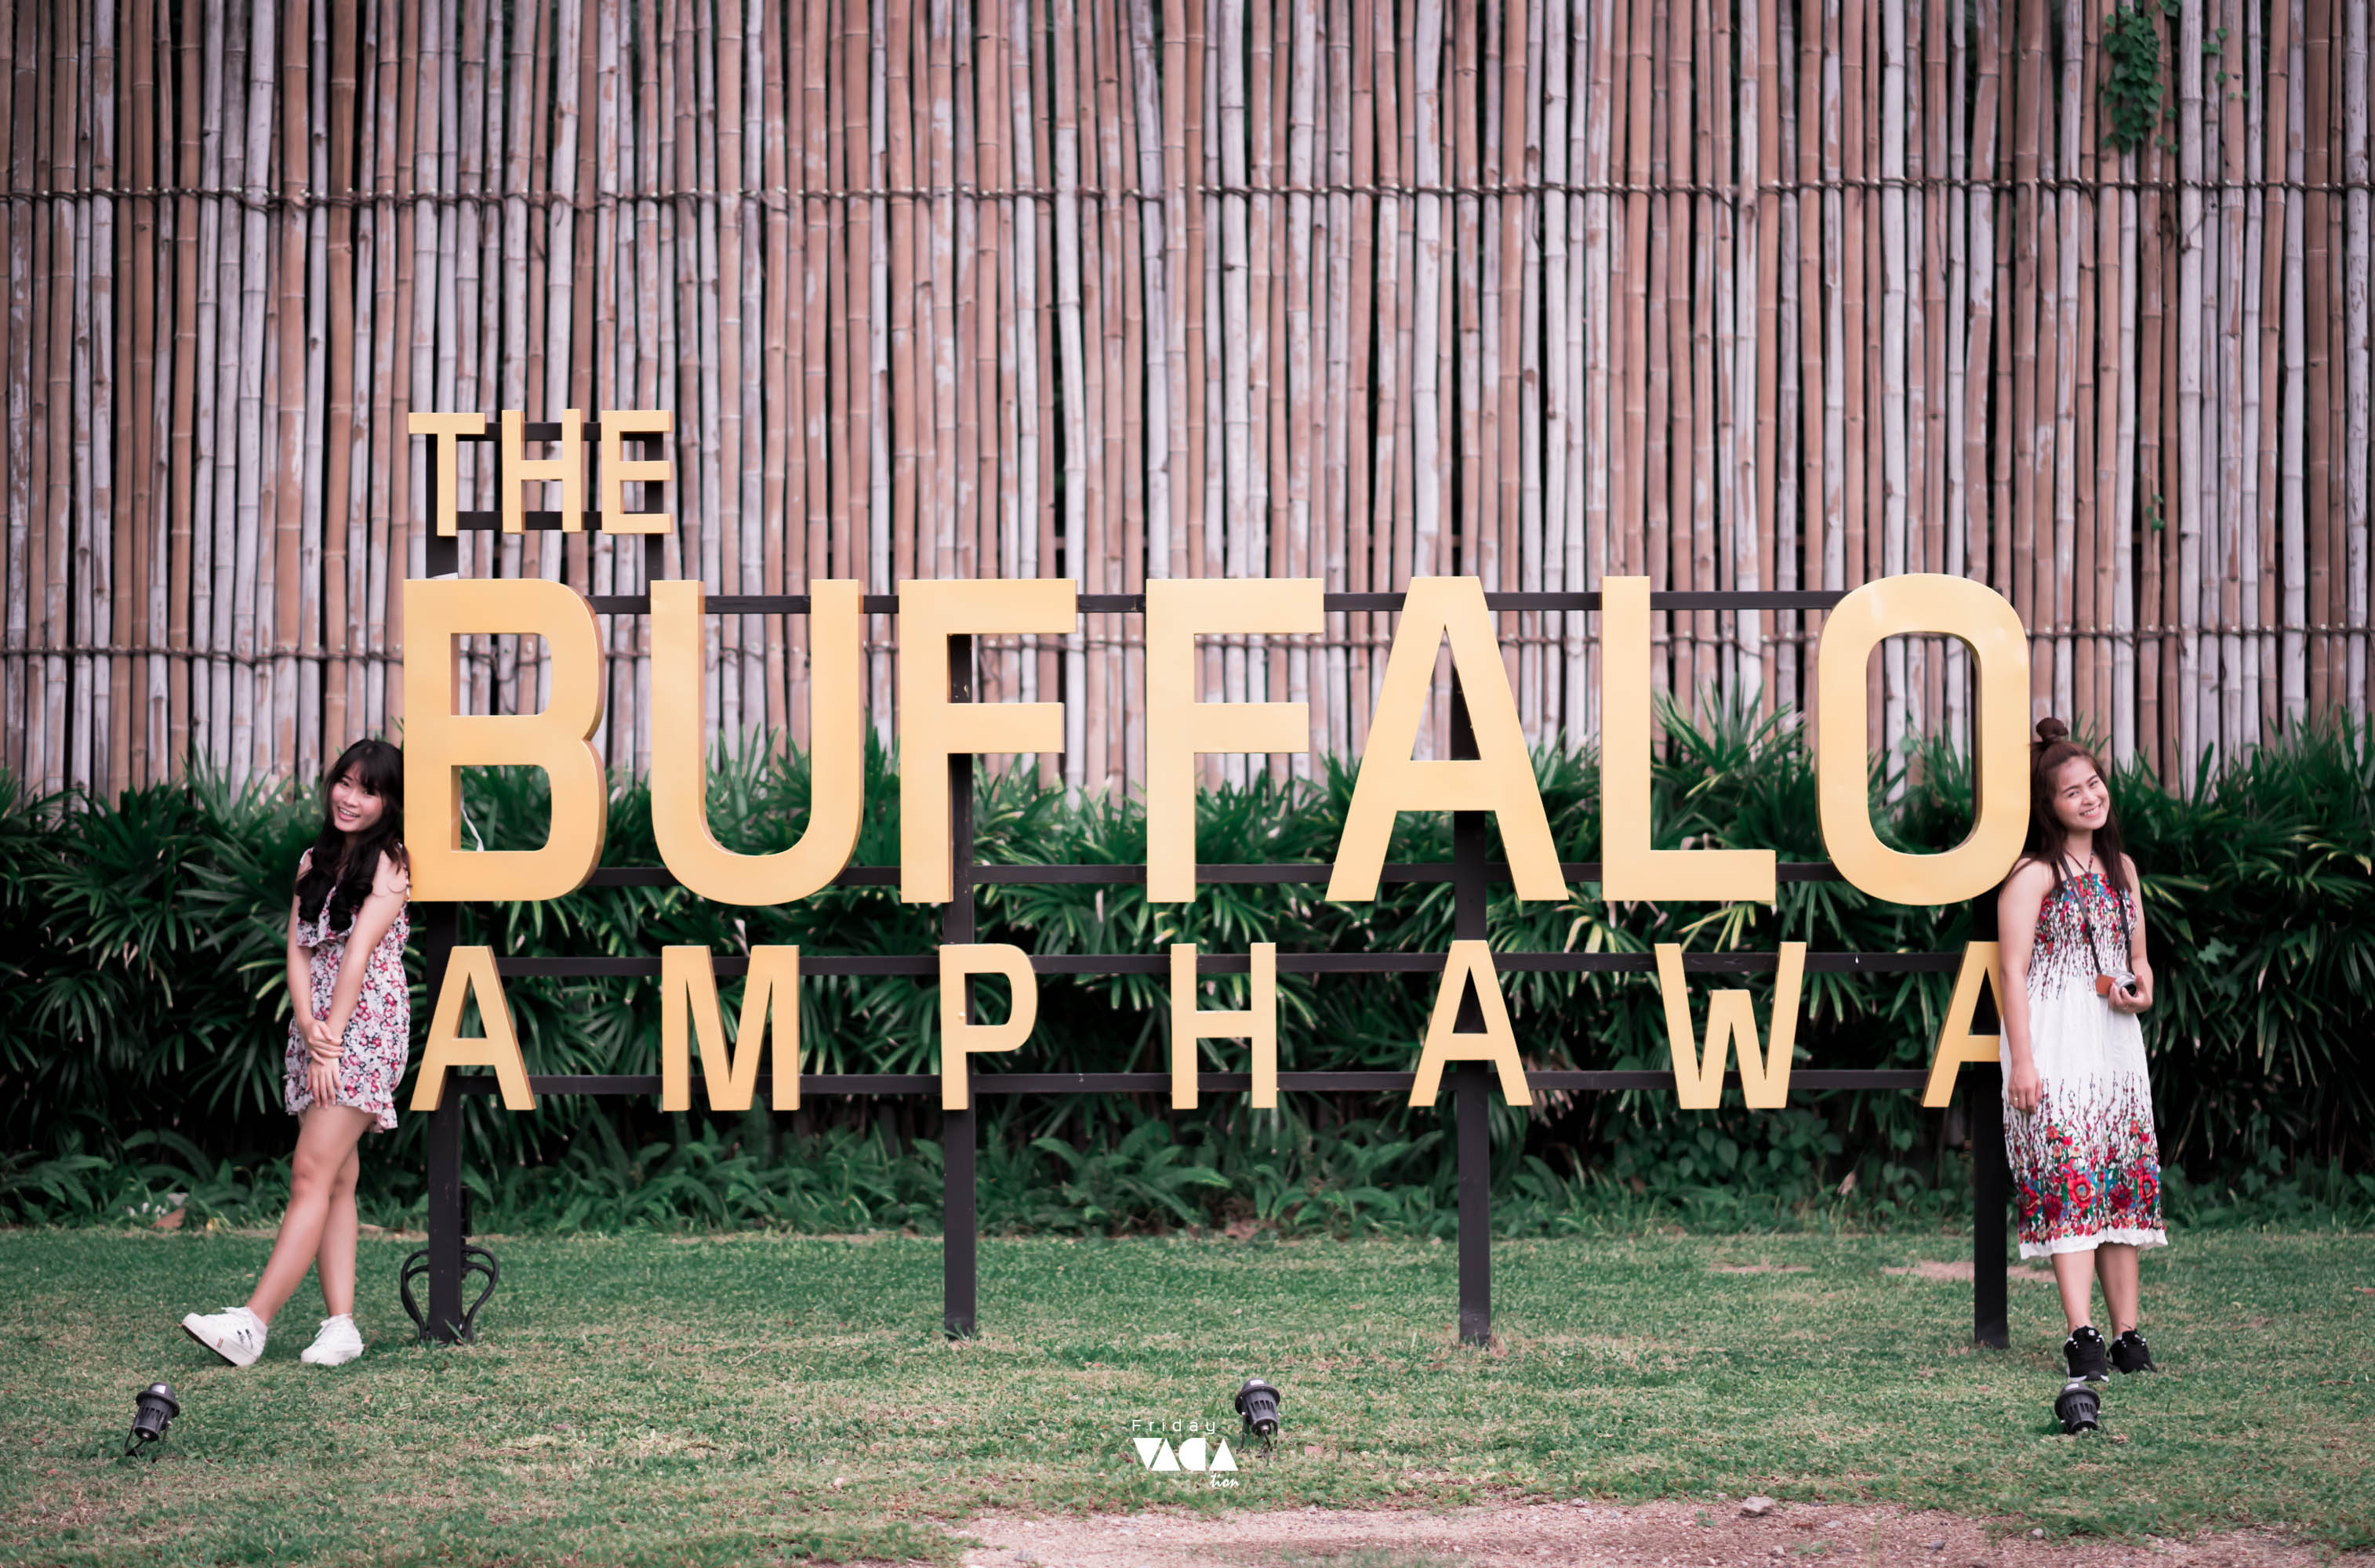 The buffalo Amphawa ที่พักอัมพวาเปิดใหม่ นครศรีดีย์